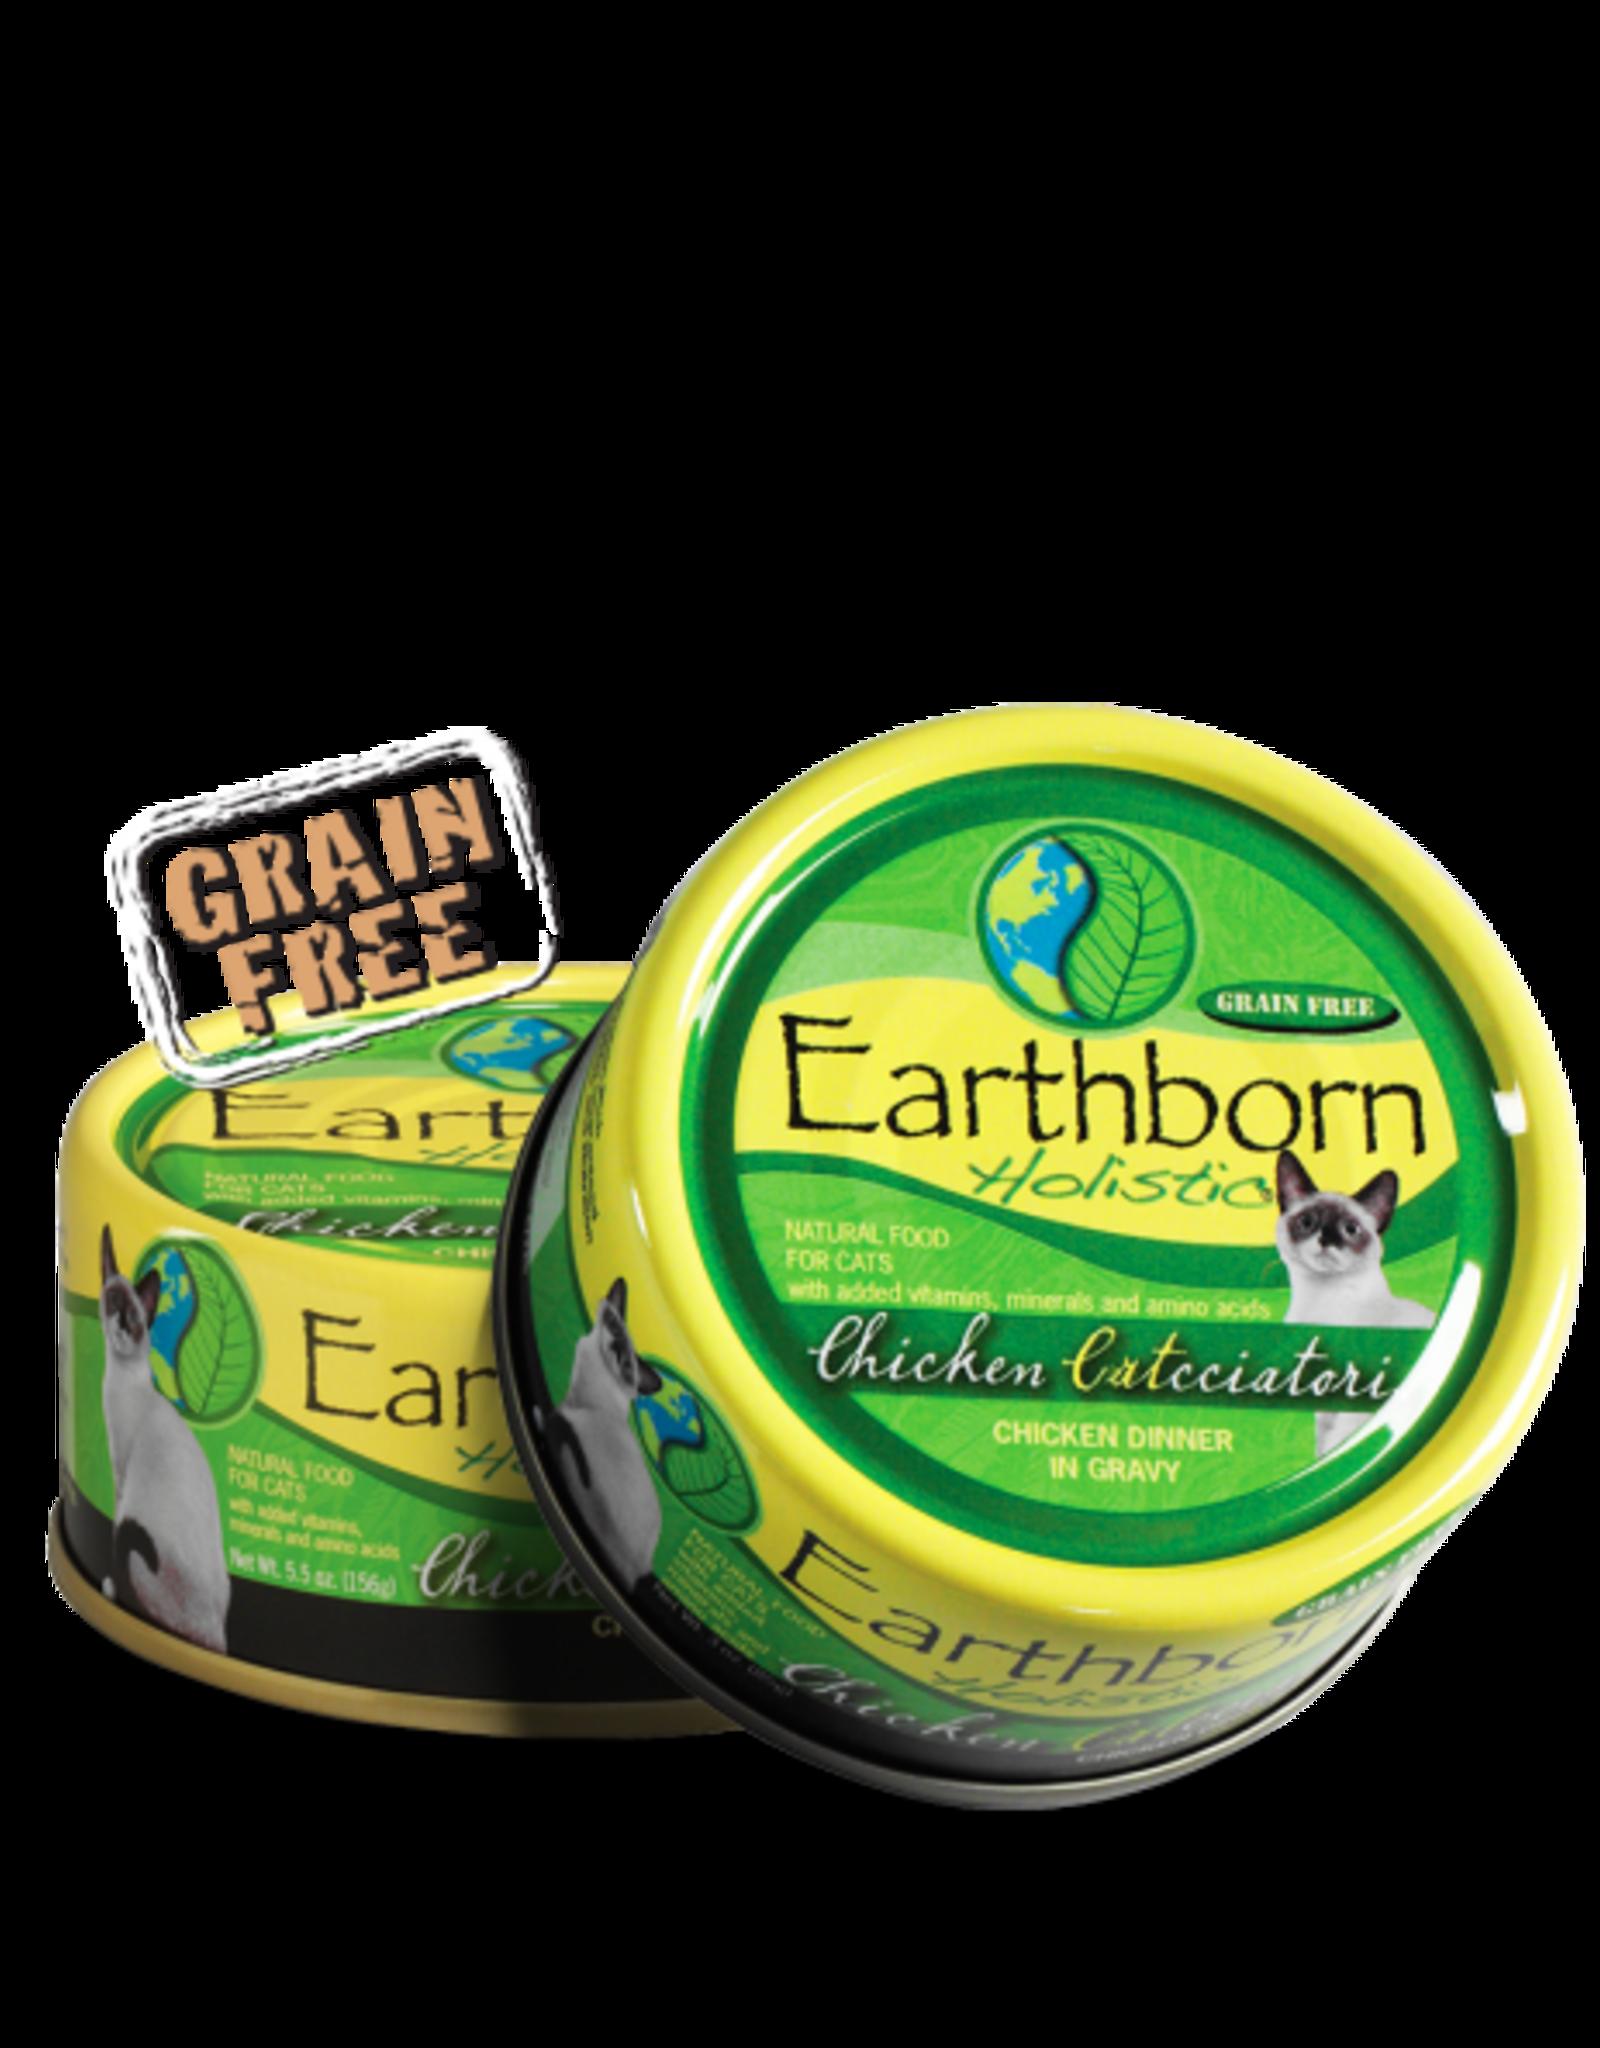 EARTHBORN EARTHBORN HOLISTIC CHICKEN CATCCIATORI CHICKEN/GRAVY 3OZ CASE OF 24